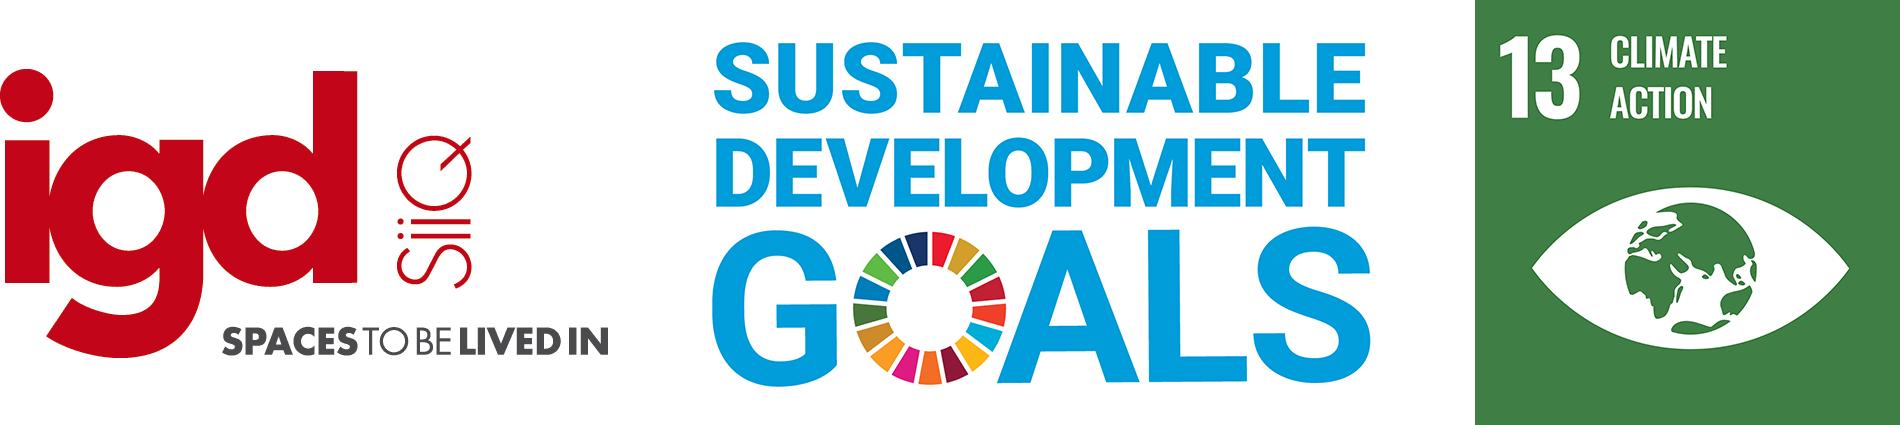 SDG_IGD_eng_13